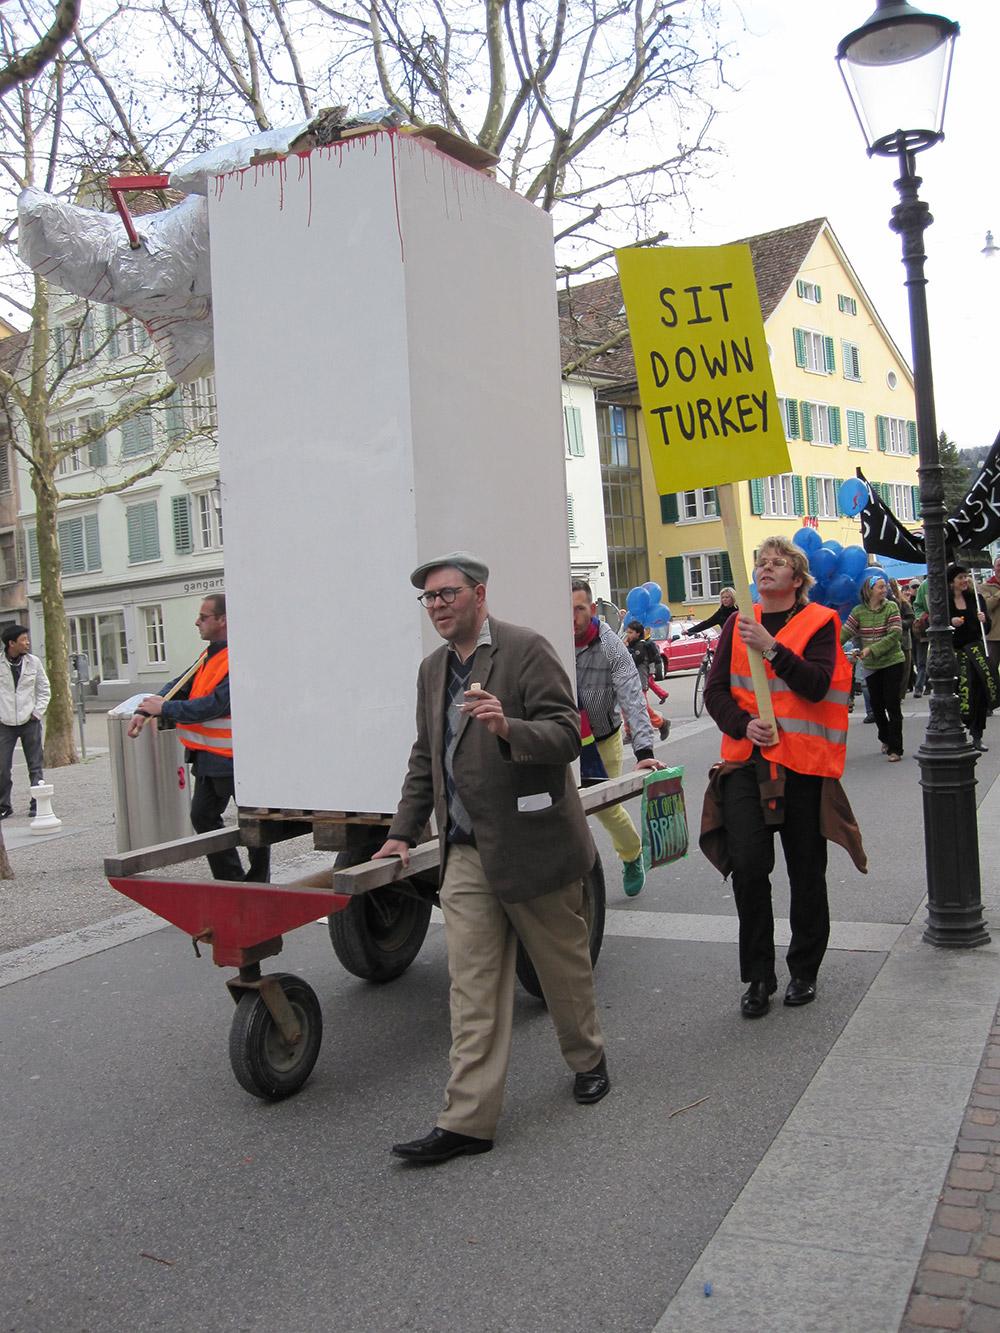 Kunstparade-Kunsthalle-Winterthur-2010-2.jpg